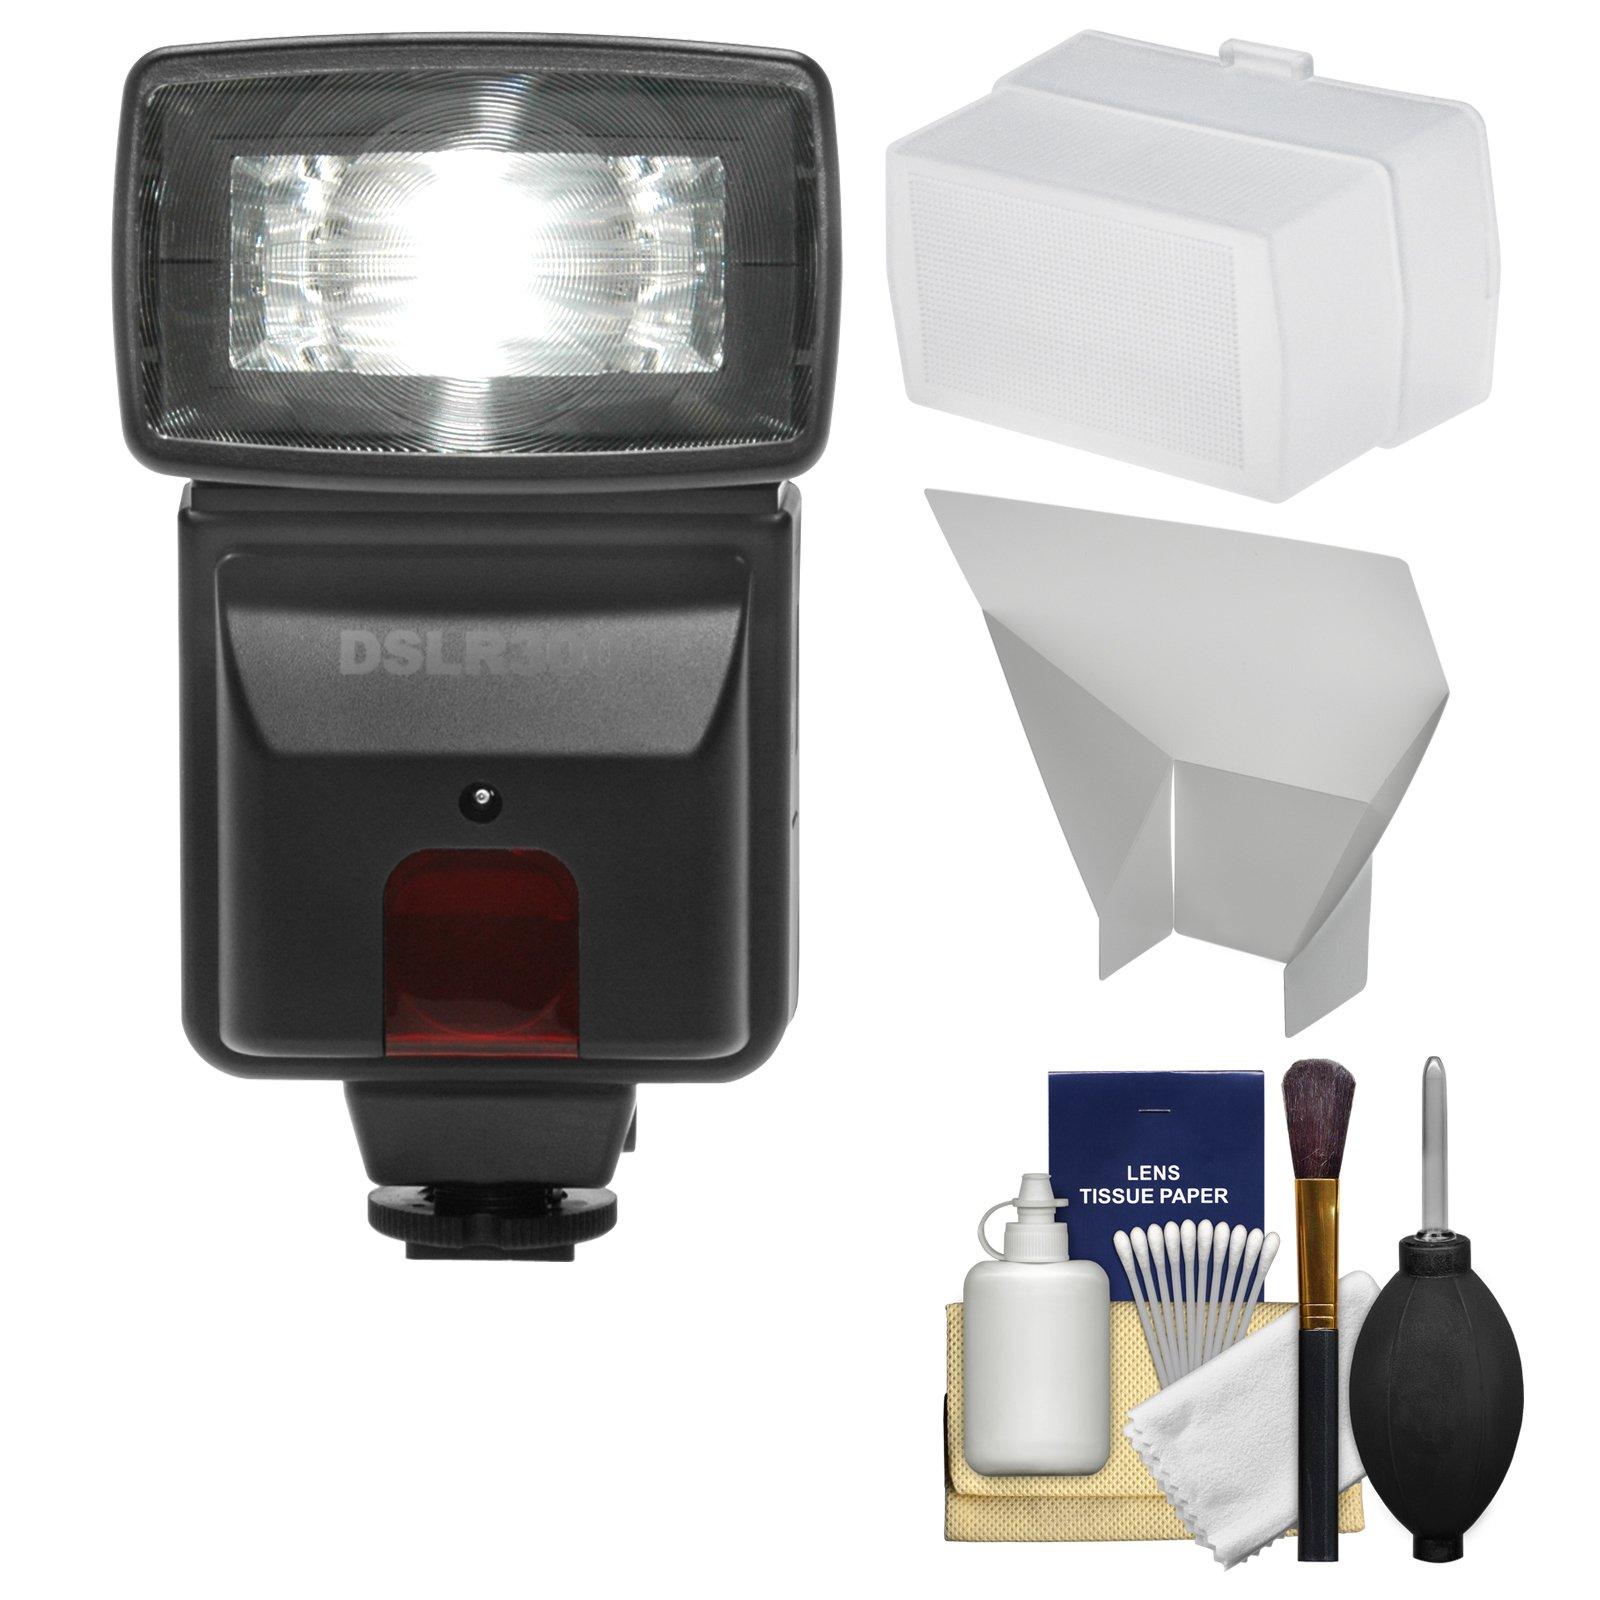 Precision Design DSLR300 High Power Auto Flash with Diffuser + Reflector + Kit for Canon EOS 70D, 7D Mark II, Rebel T3, T3i, T5, T5i, T6i, T6s, SL1 Cameras by Precision Design